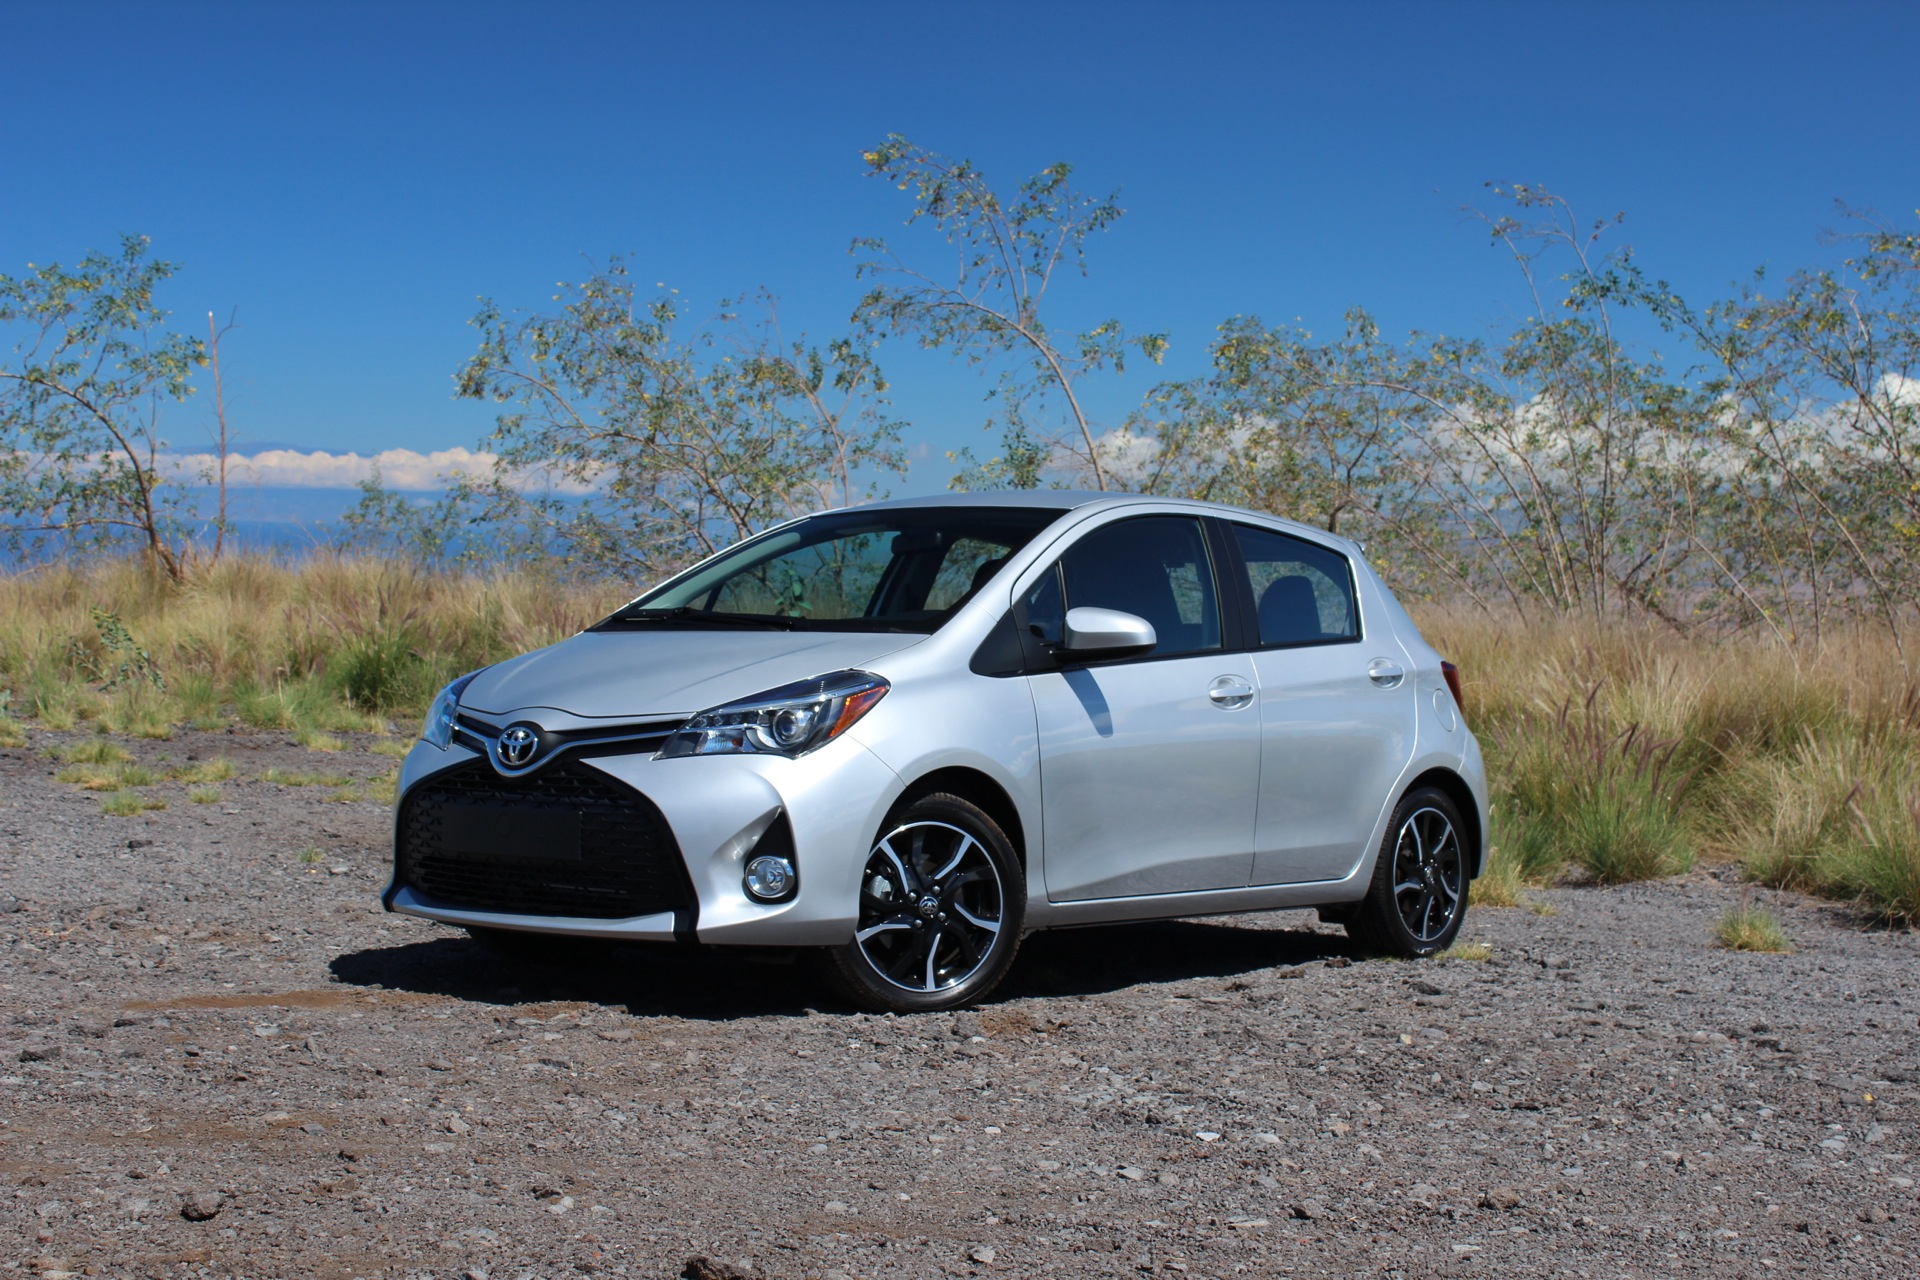 Kelebihan Toyota Yaris 2015 Tangguh